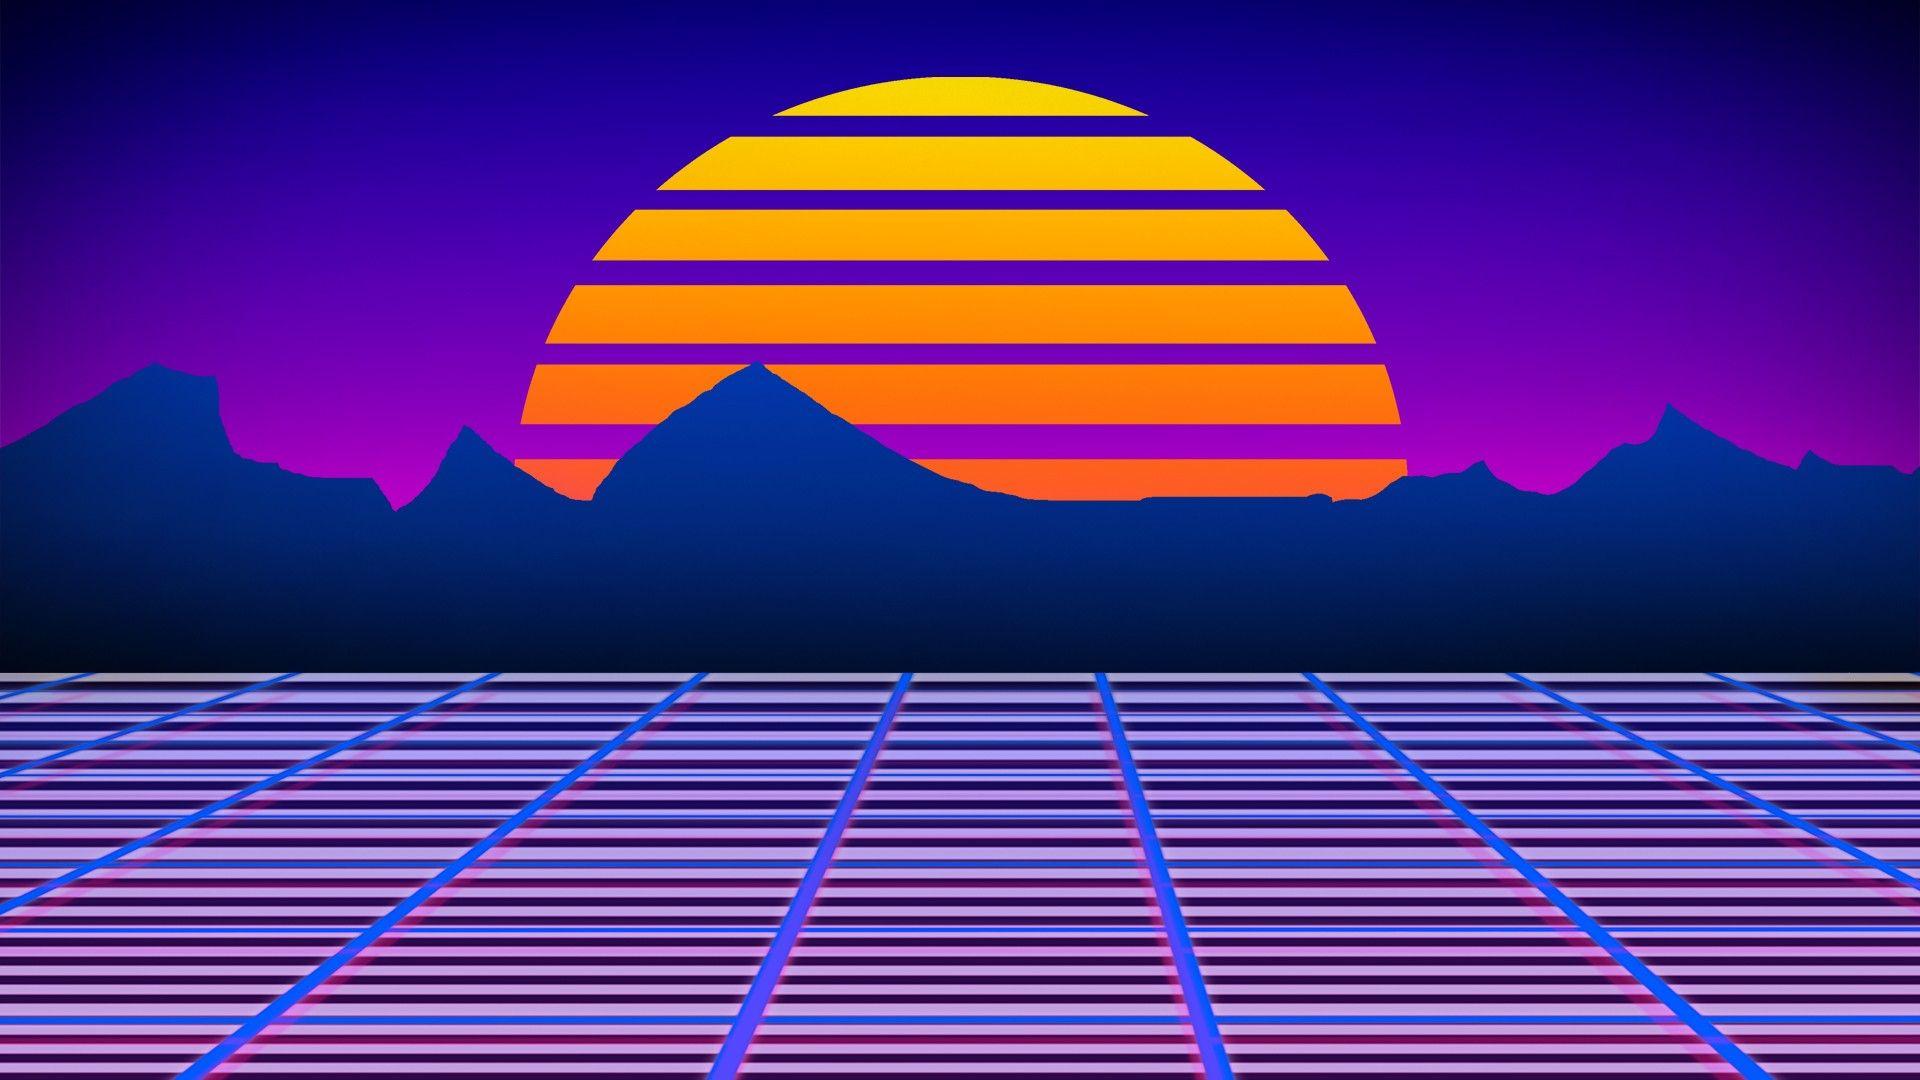 1980s Neon Wallpaper Lazer Mohawk Retro Games Robot Sunset